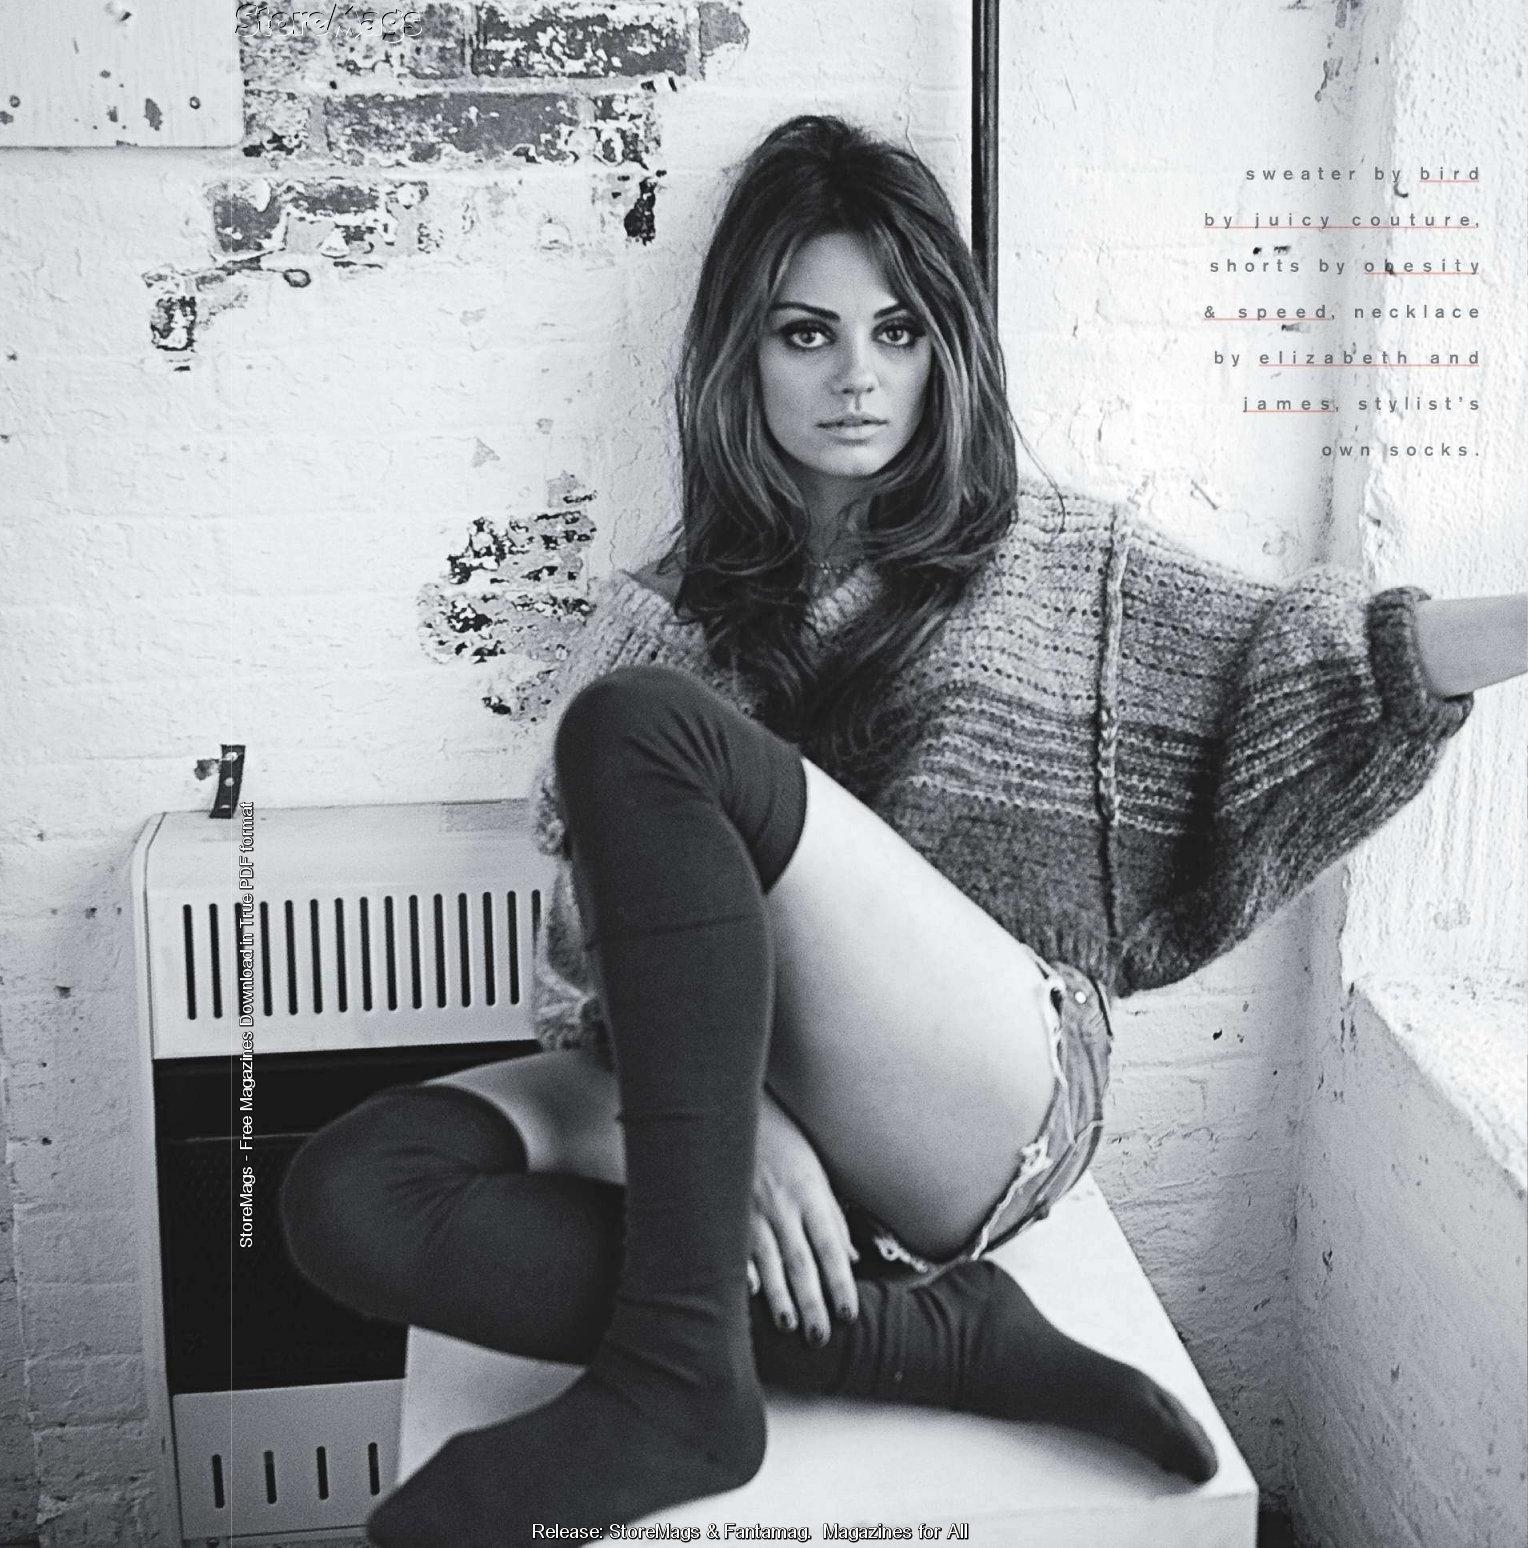 http://2.bp.blogspot.com/_s5f7btuhJwk/TPE5Zy1VzFI/AAAAAAAAAOA/tUpCxt1Zr68/s1600/Mila-Kunis-Nylon-Magazine-Cover-January-2011-4.jpg